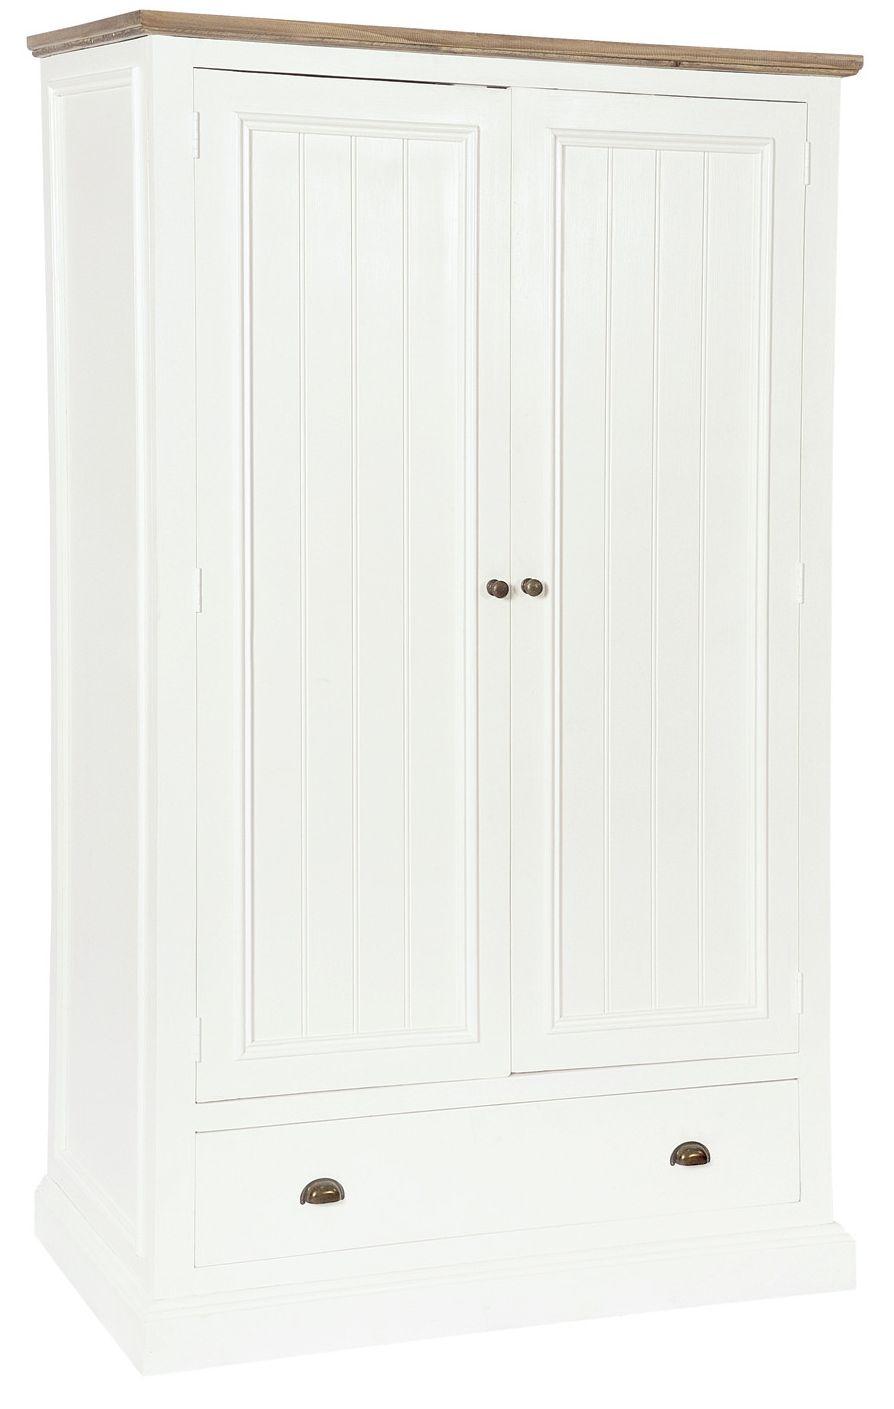 Monpellier 2 Door Wardrobe